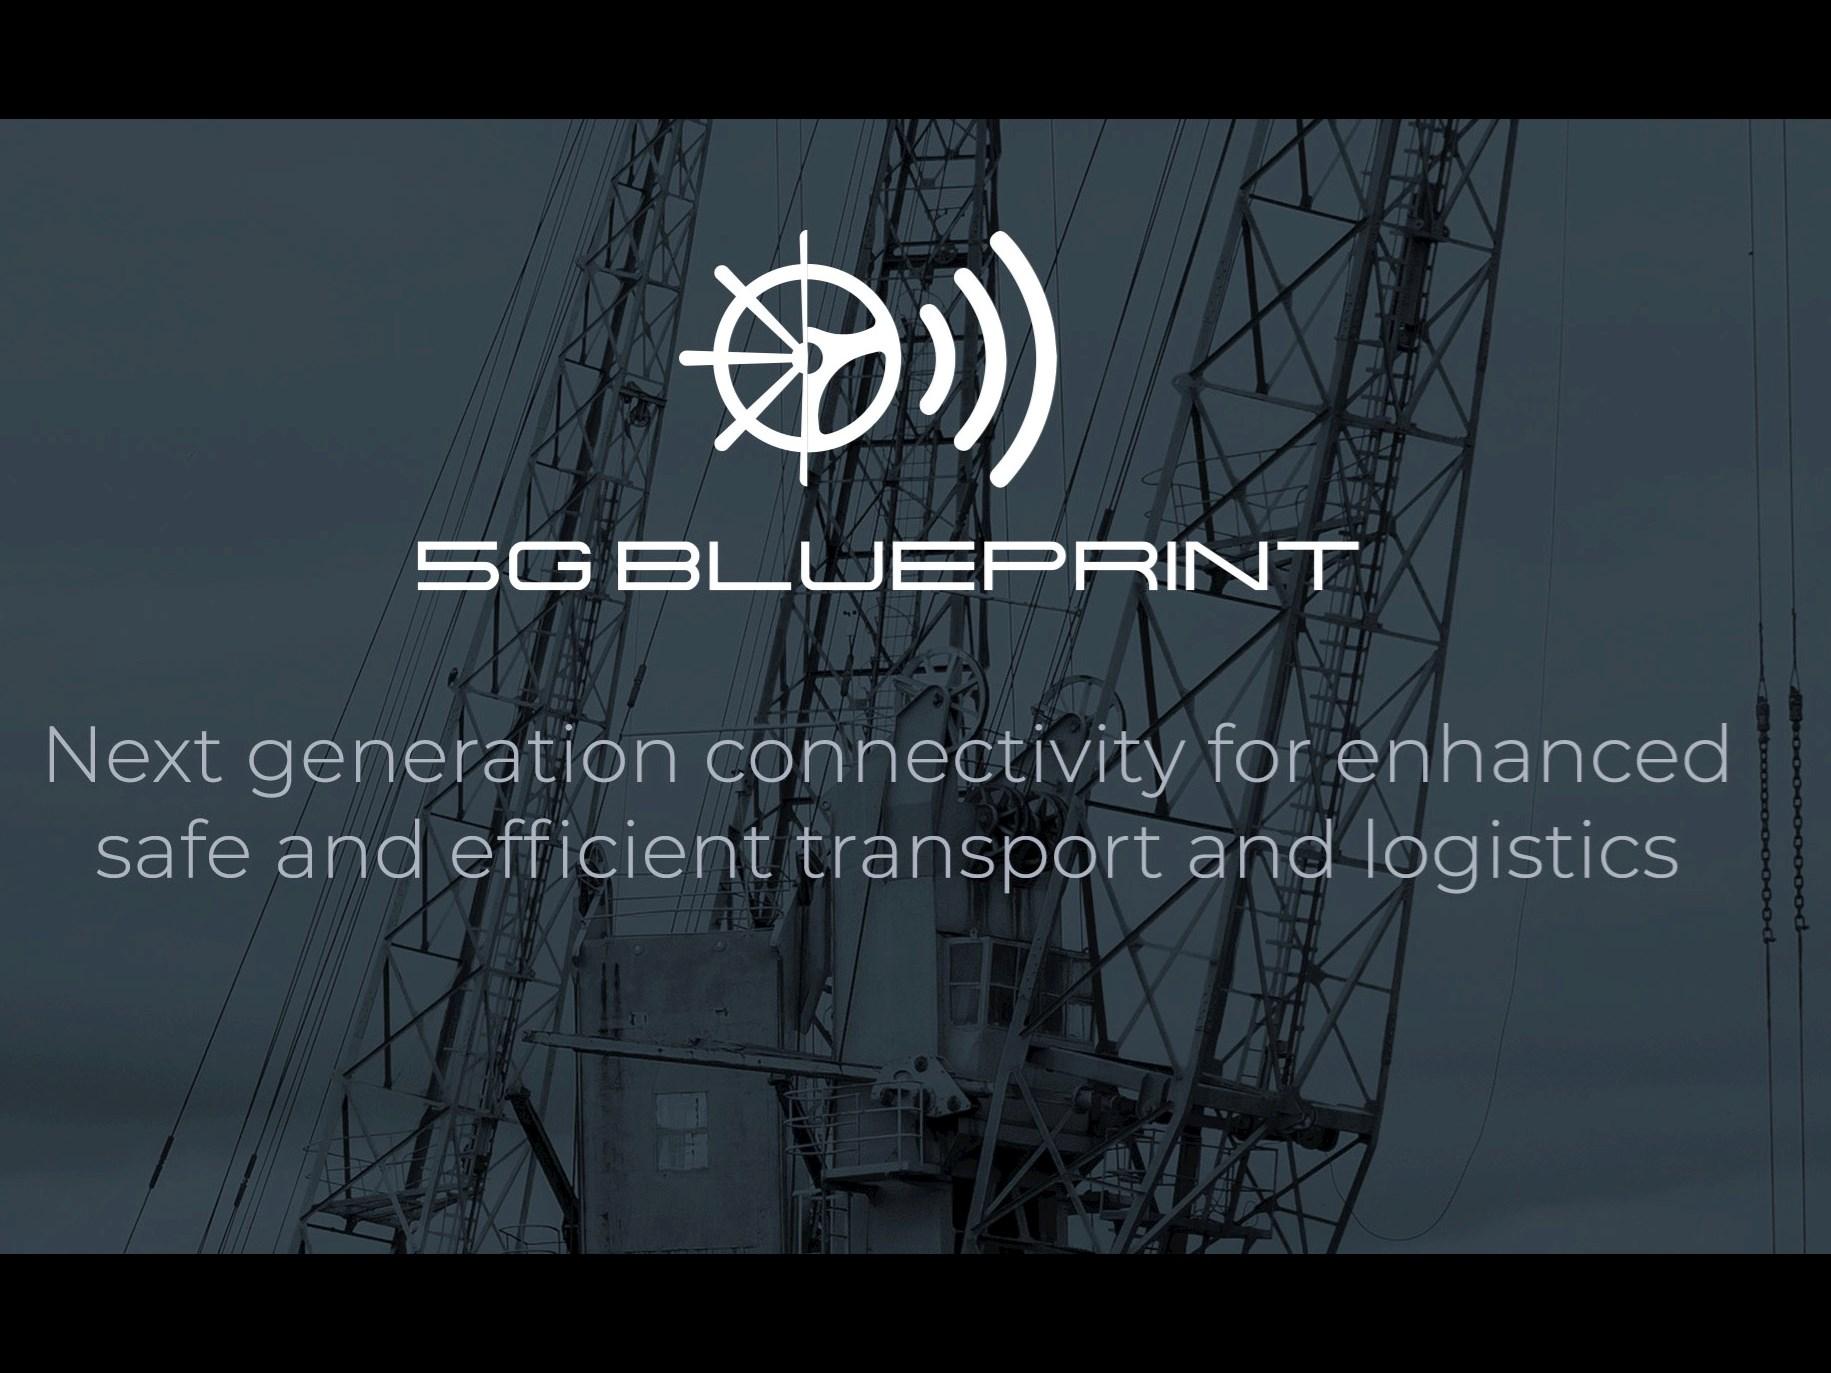 Formele kick-off internationaal onderzoeksproject 5G-Blueprint